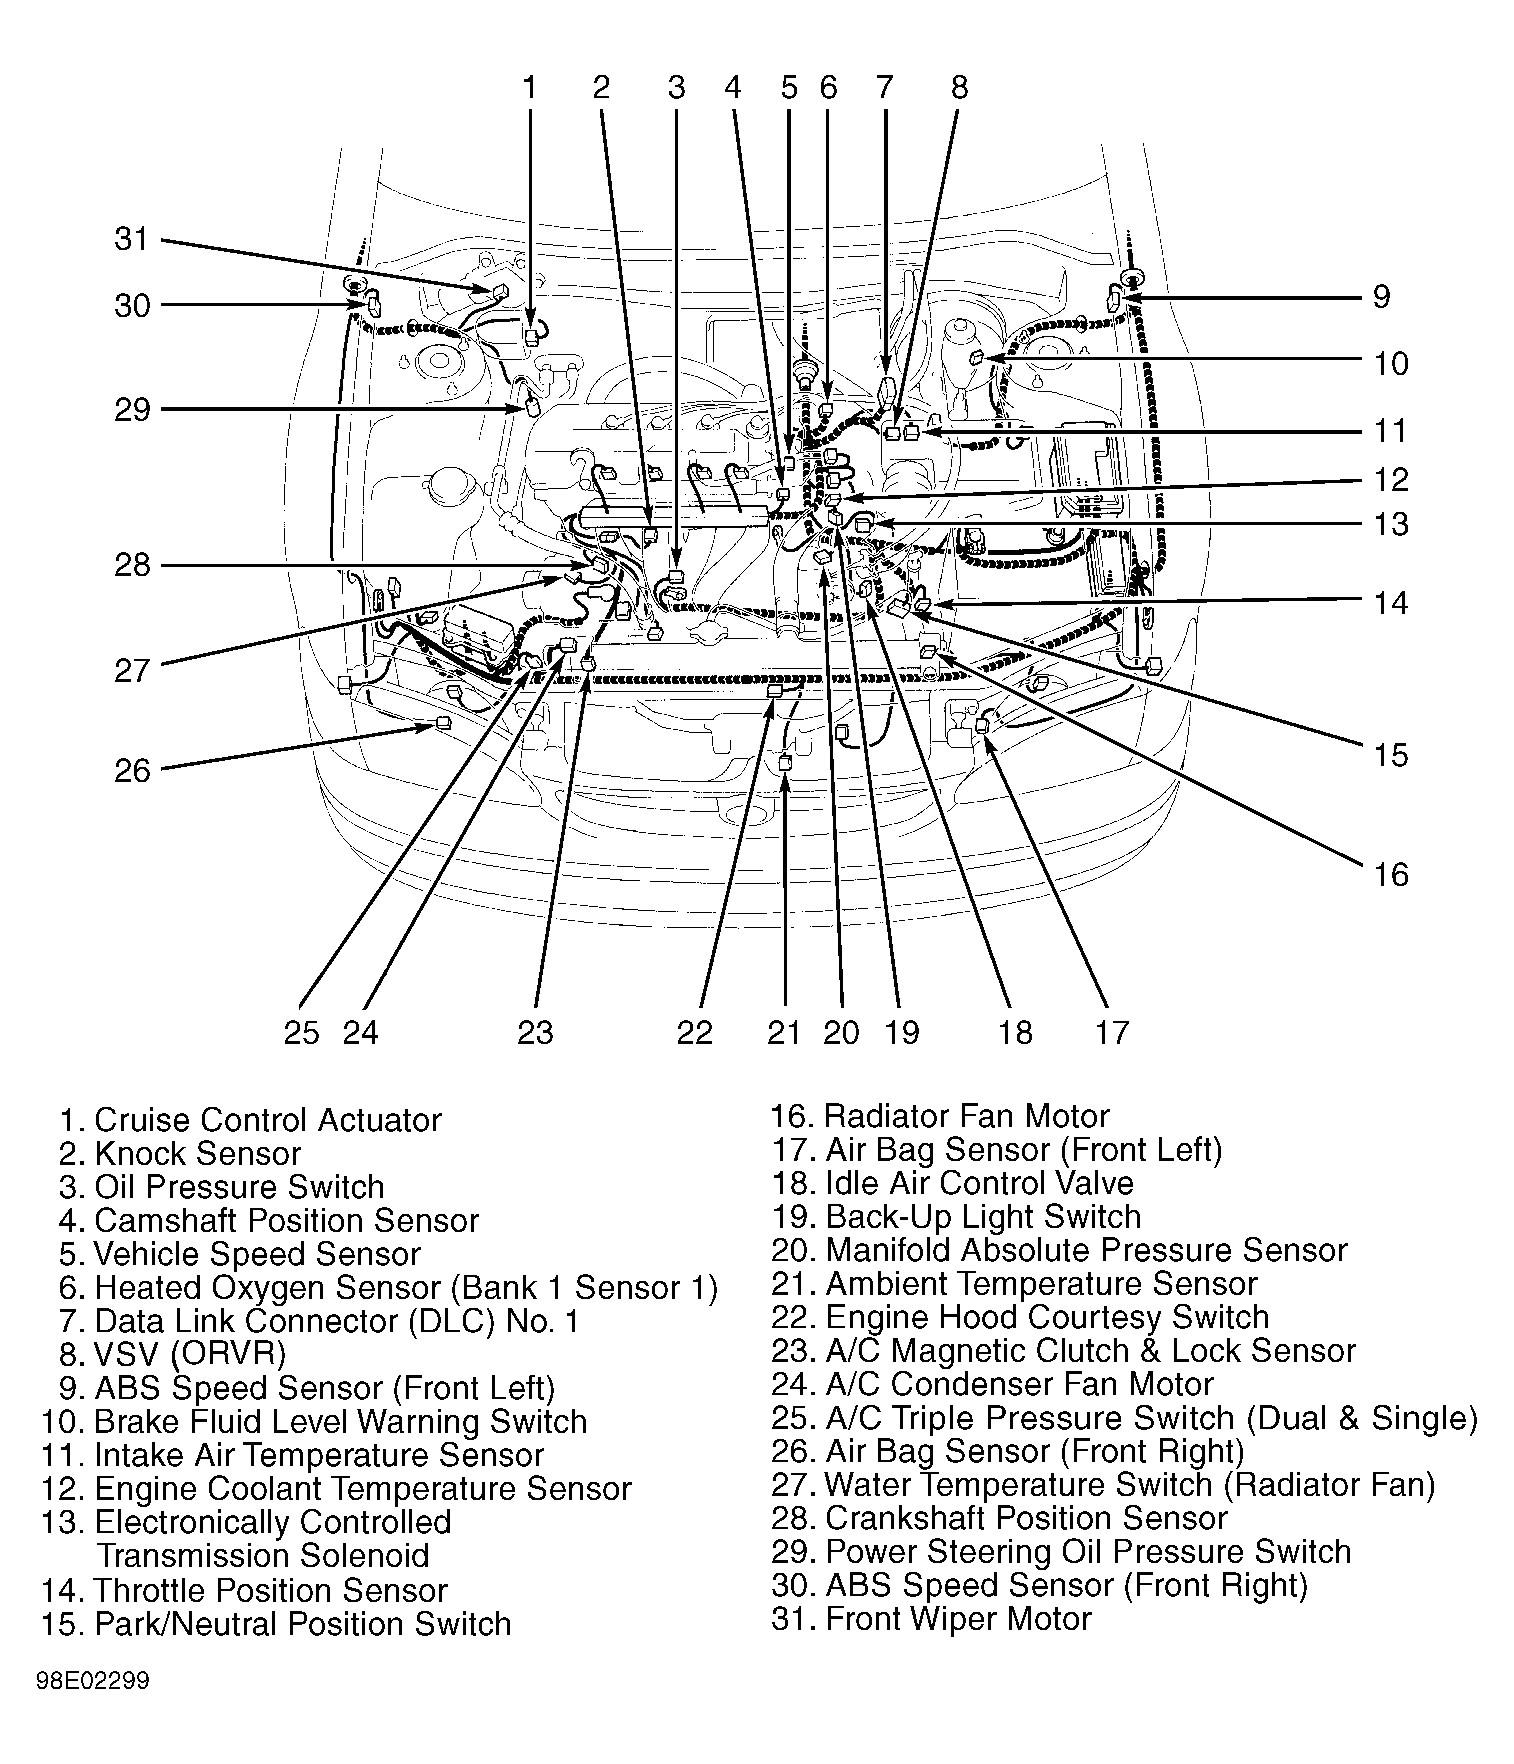 97 toyota corolla engine diagram wiring diagram paper 1997 toyota corolla engine diagram 1997 toyota corolla engine diagram